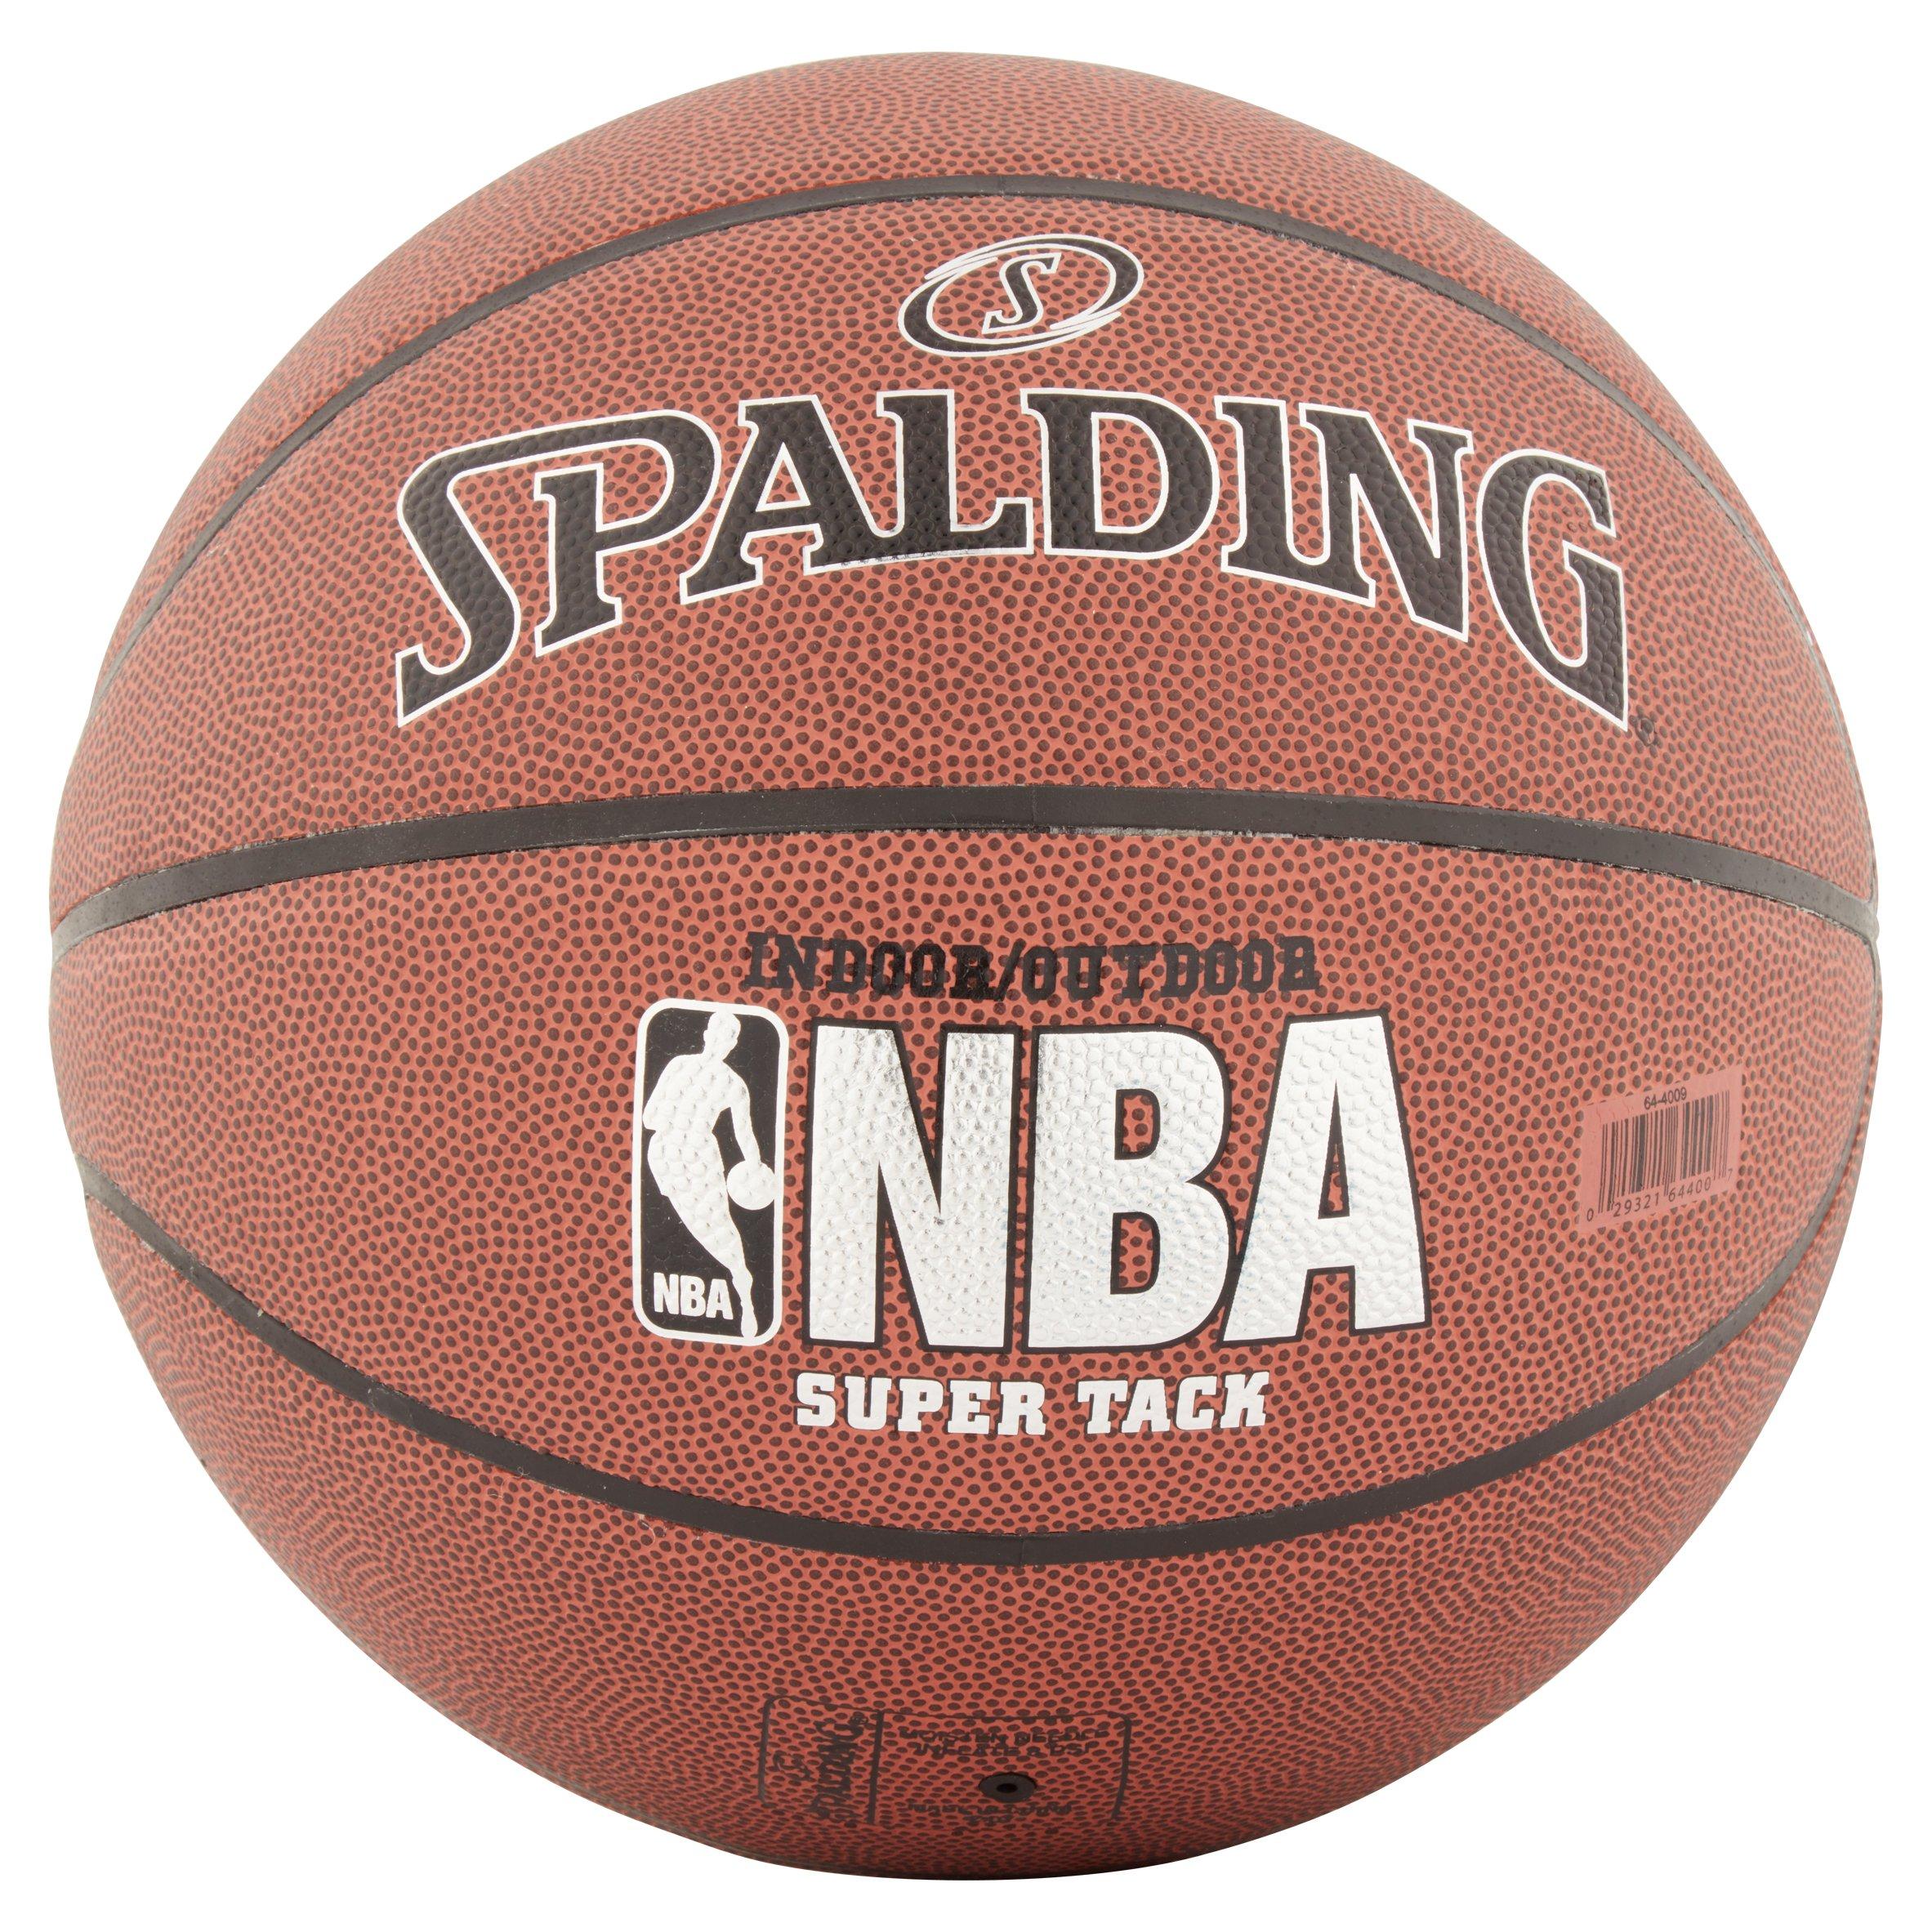 Spalding NBA SUPER TACK Basketball - Best Basketballs